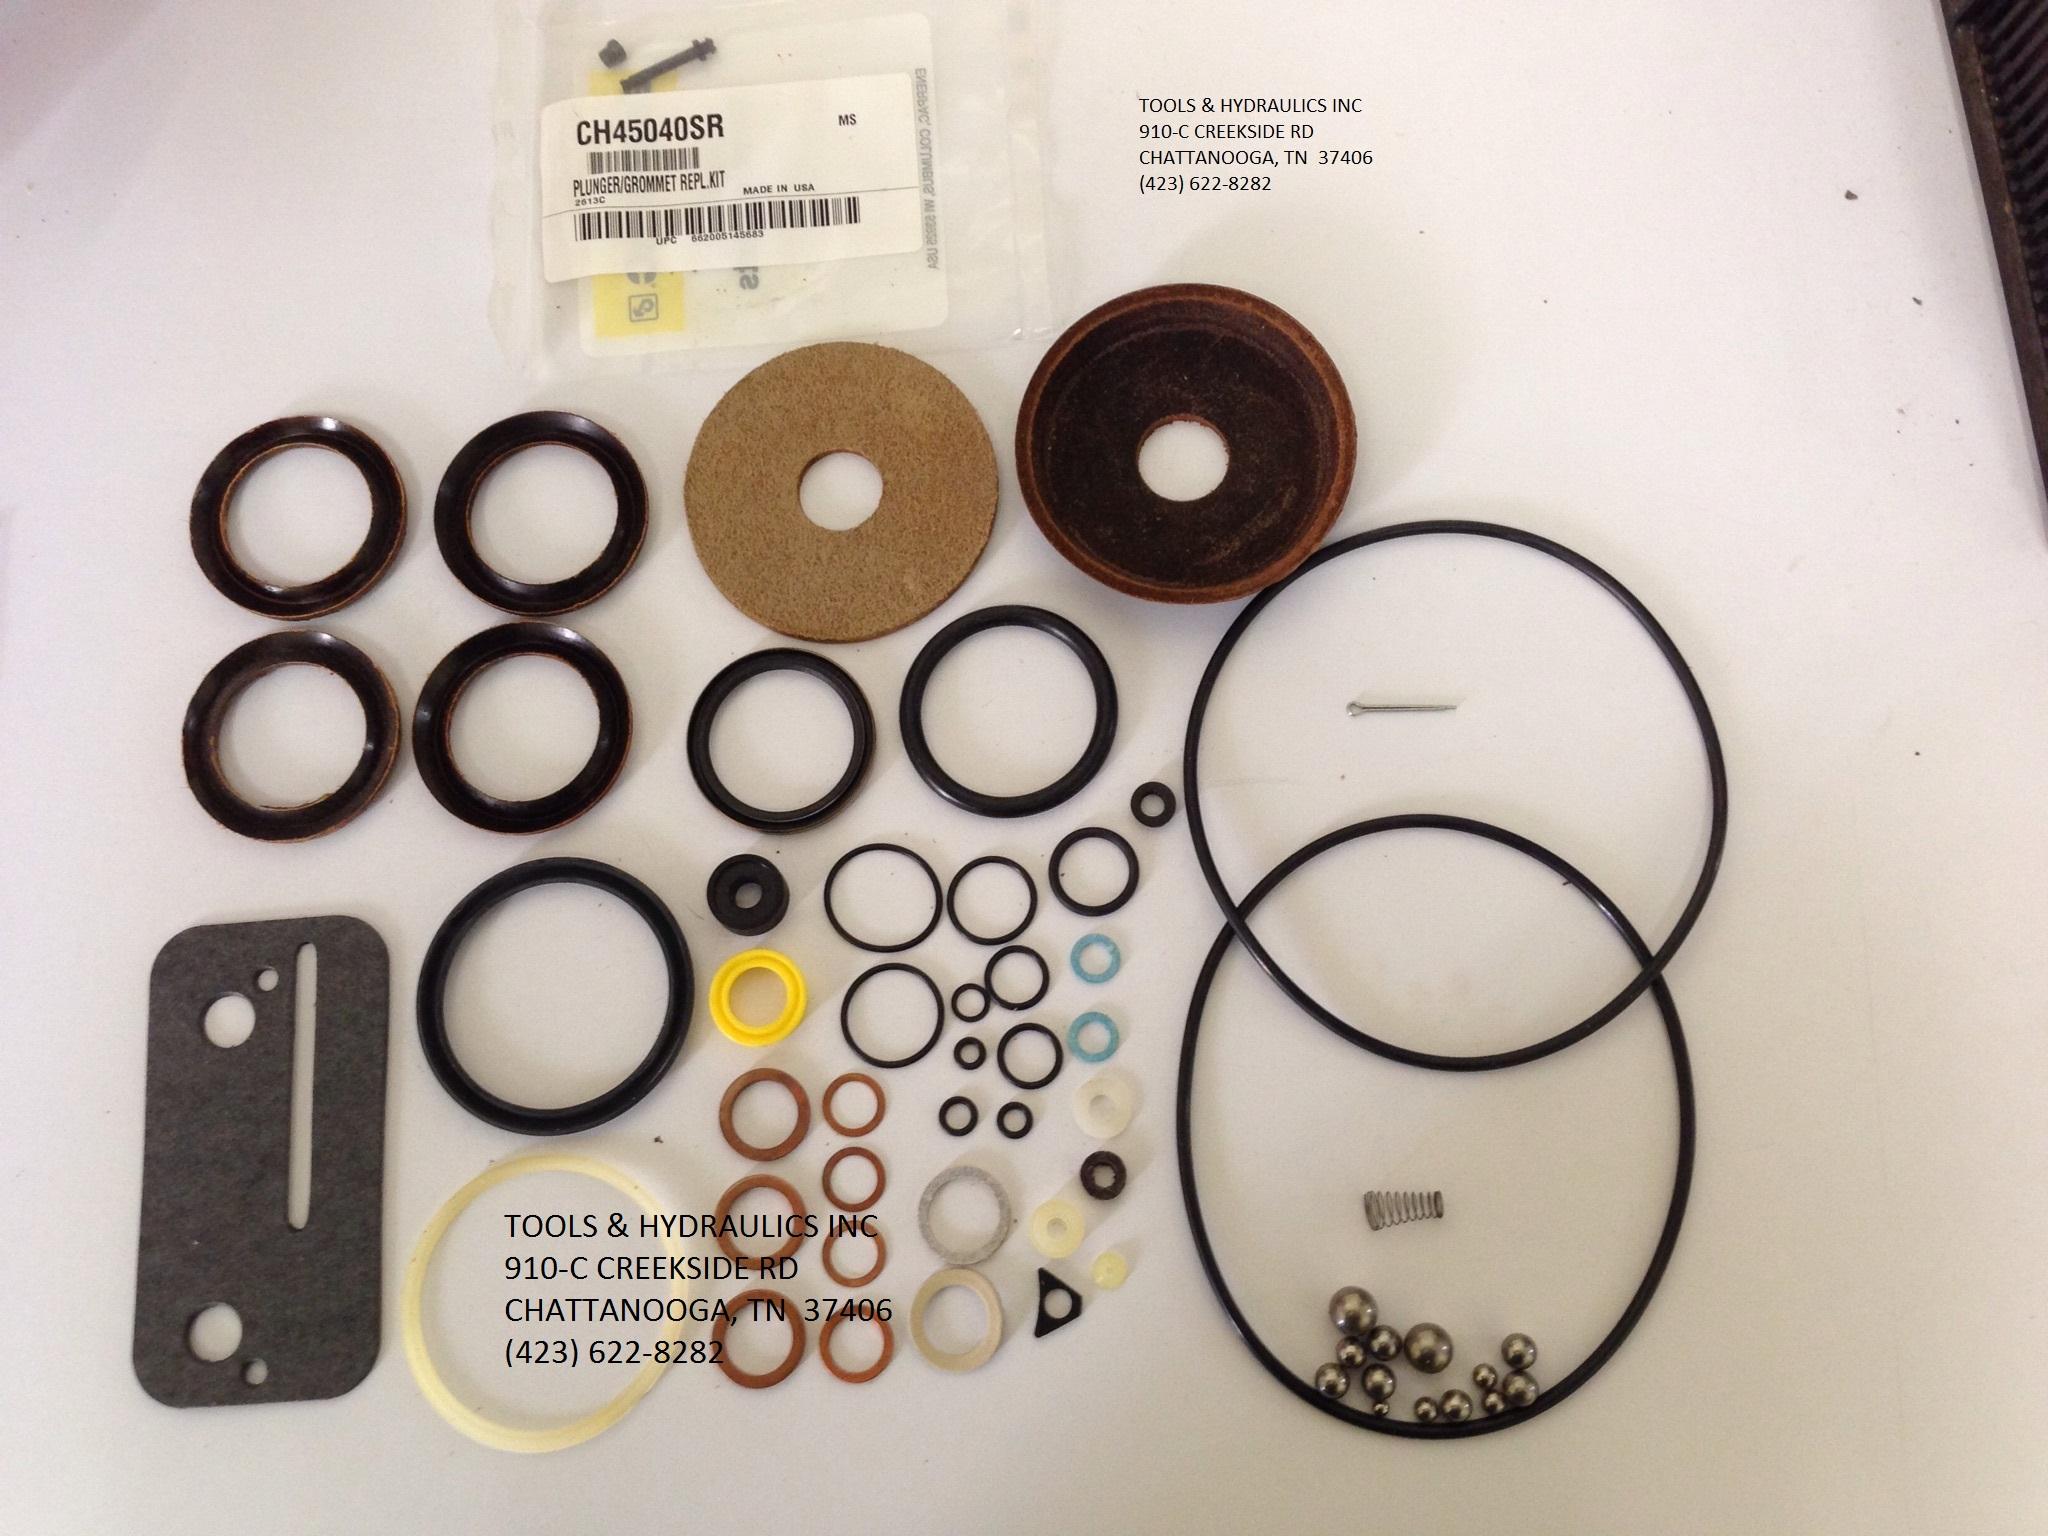 blackhawk floor jack parts diagram 4 pin cfl wiring tn jacks repair kits